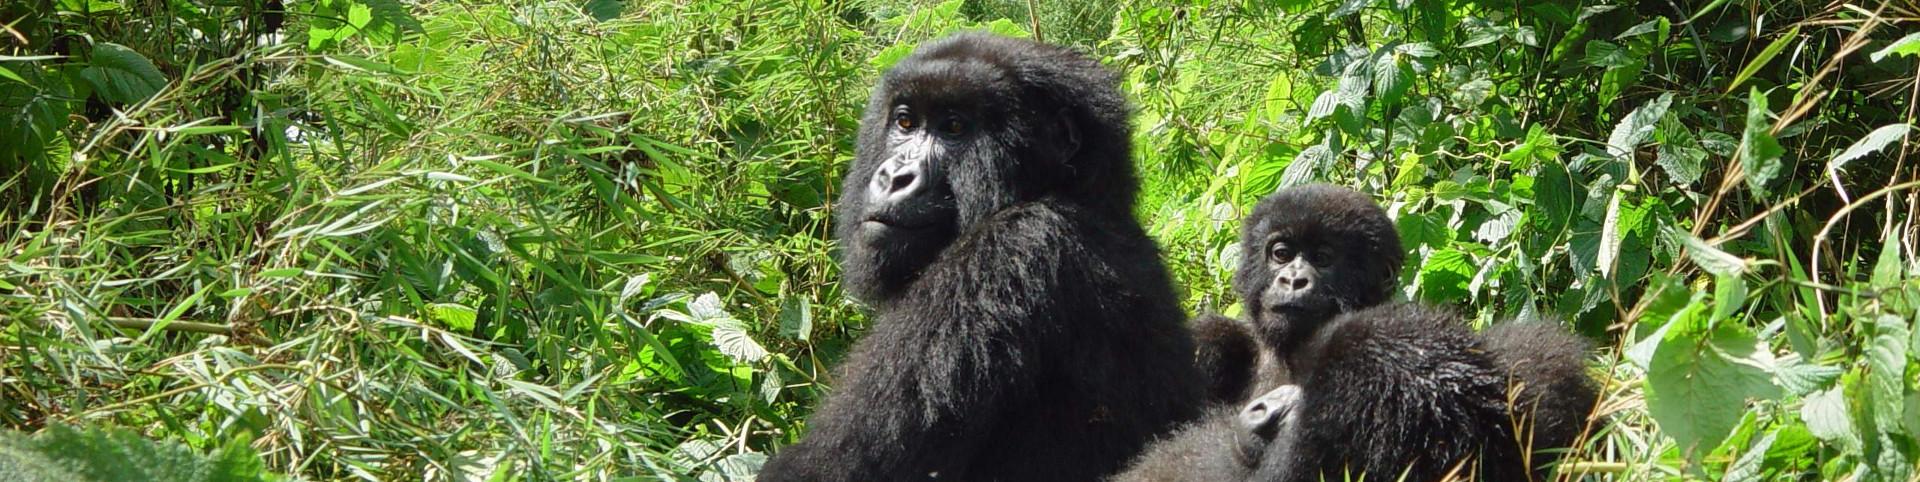 gorilla2_1920x482